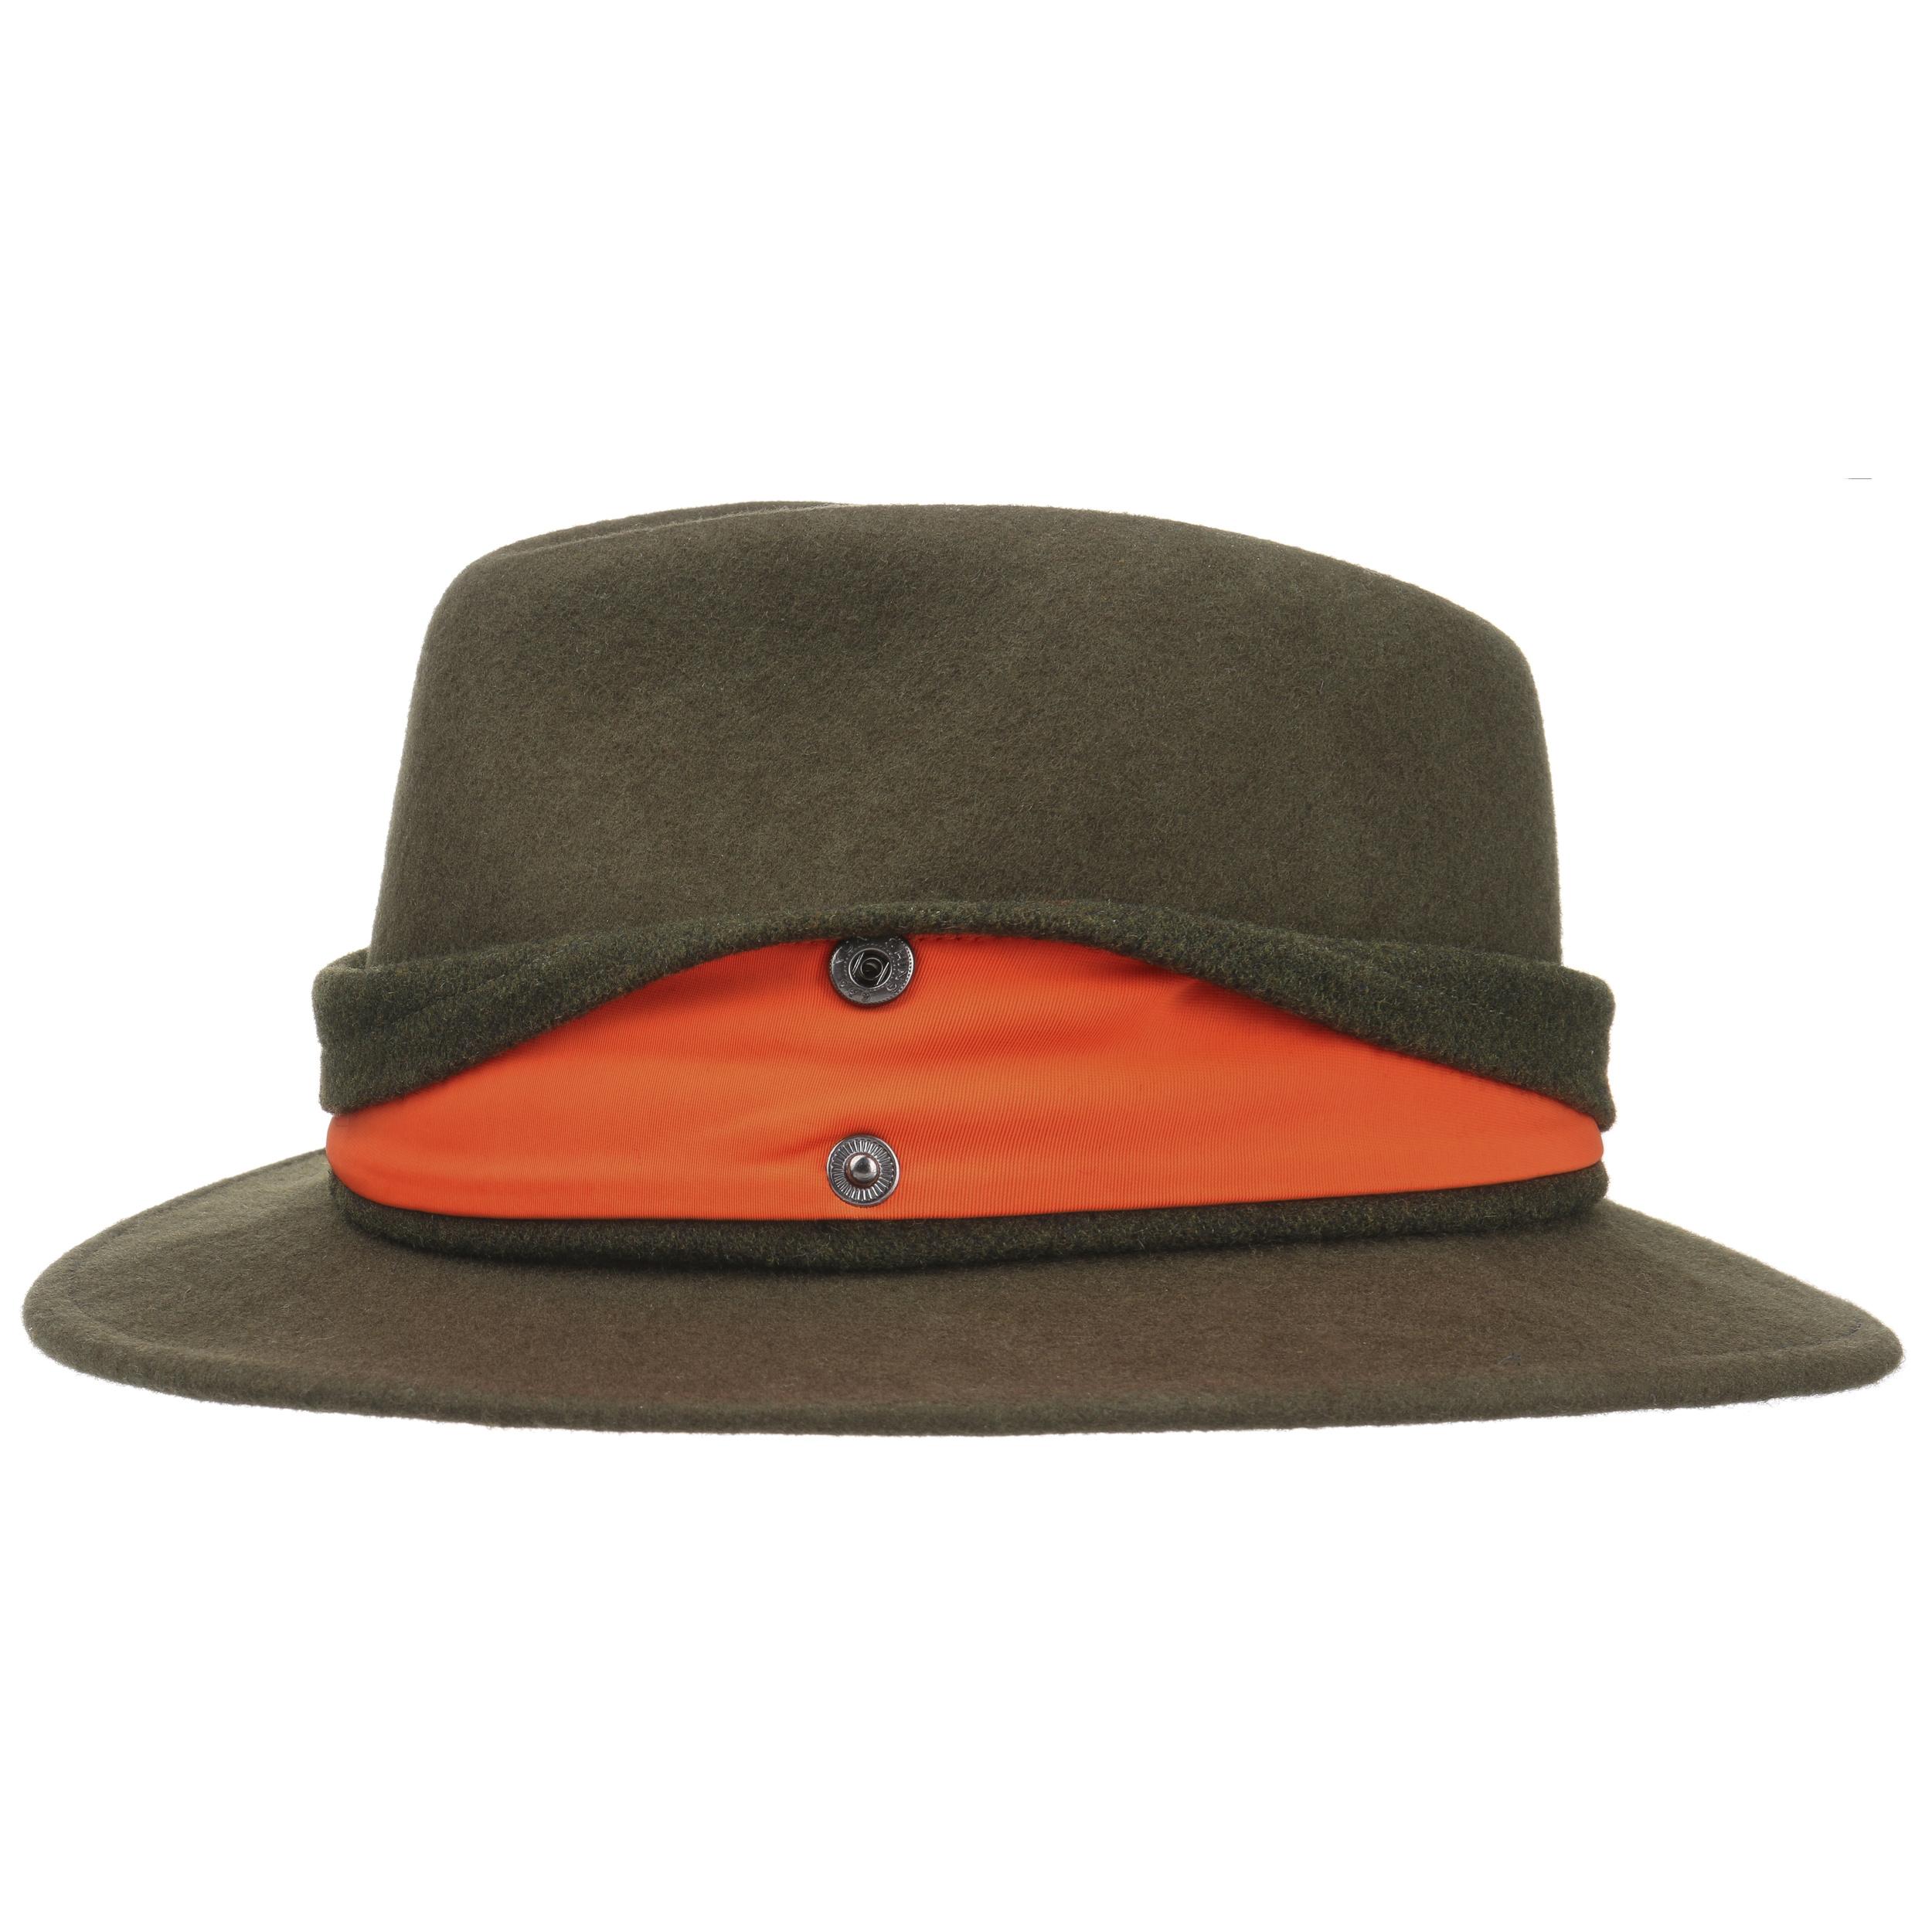 ... Sombrero para Cazar Hunting by Lierys - verde oliva 3 ... db443ac16f9